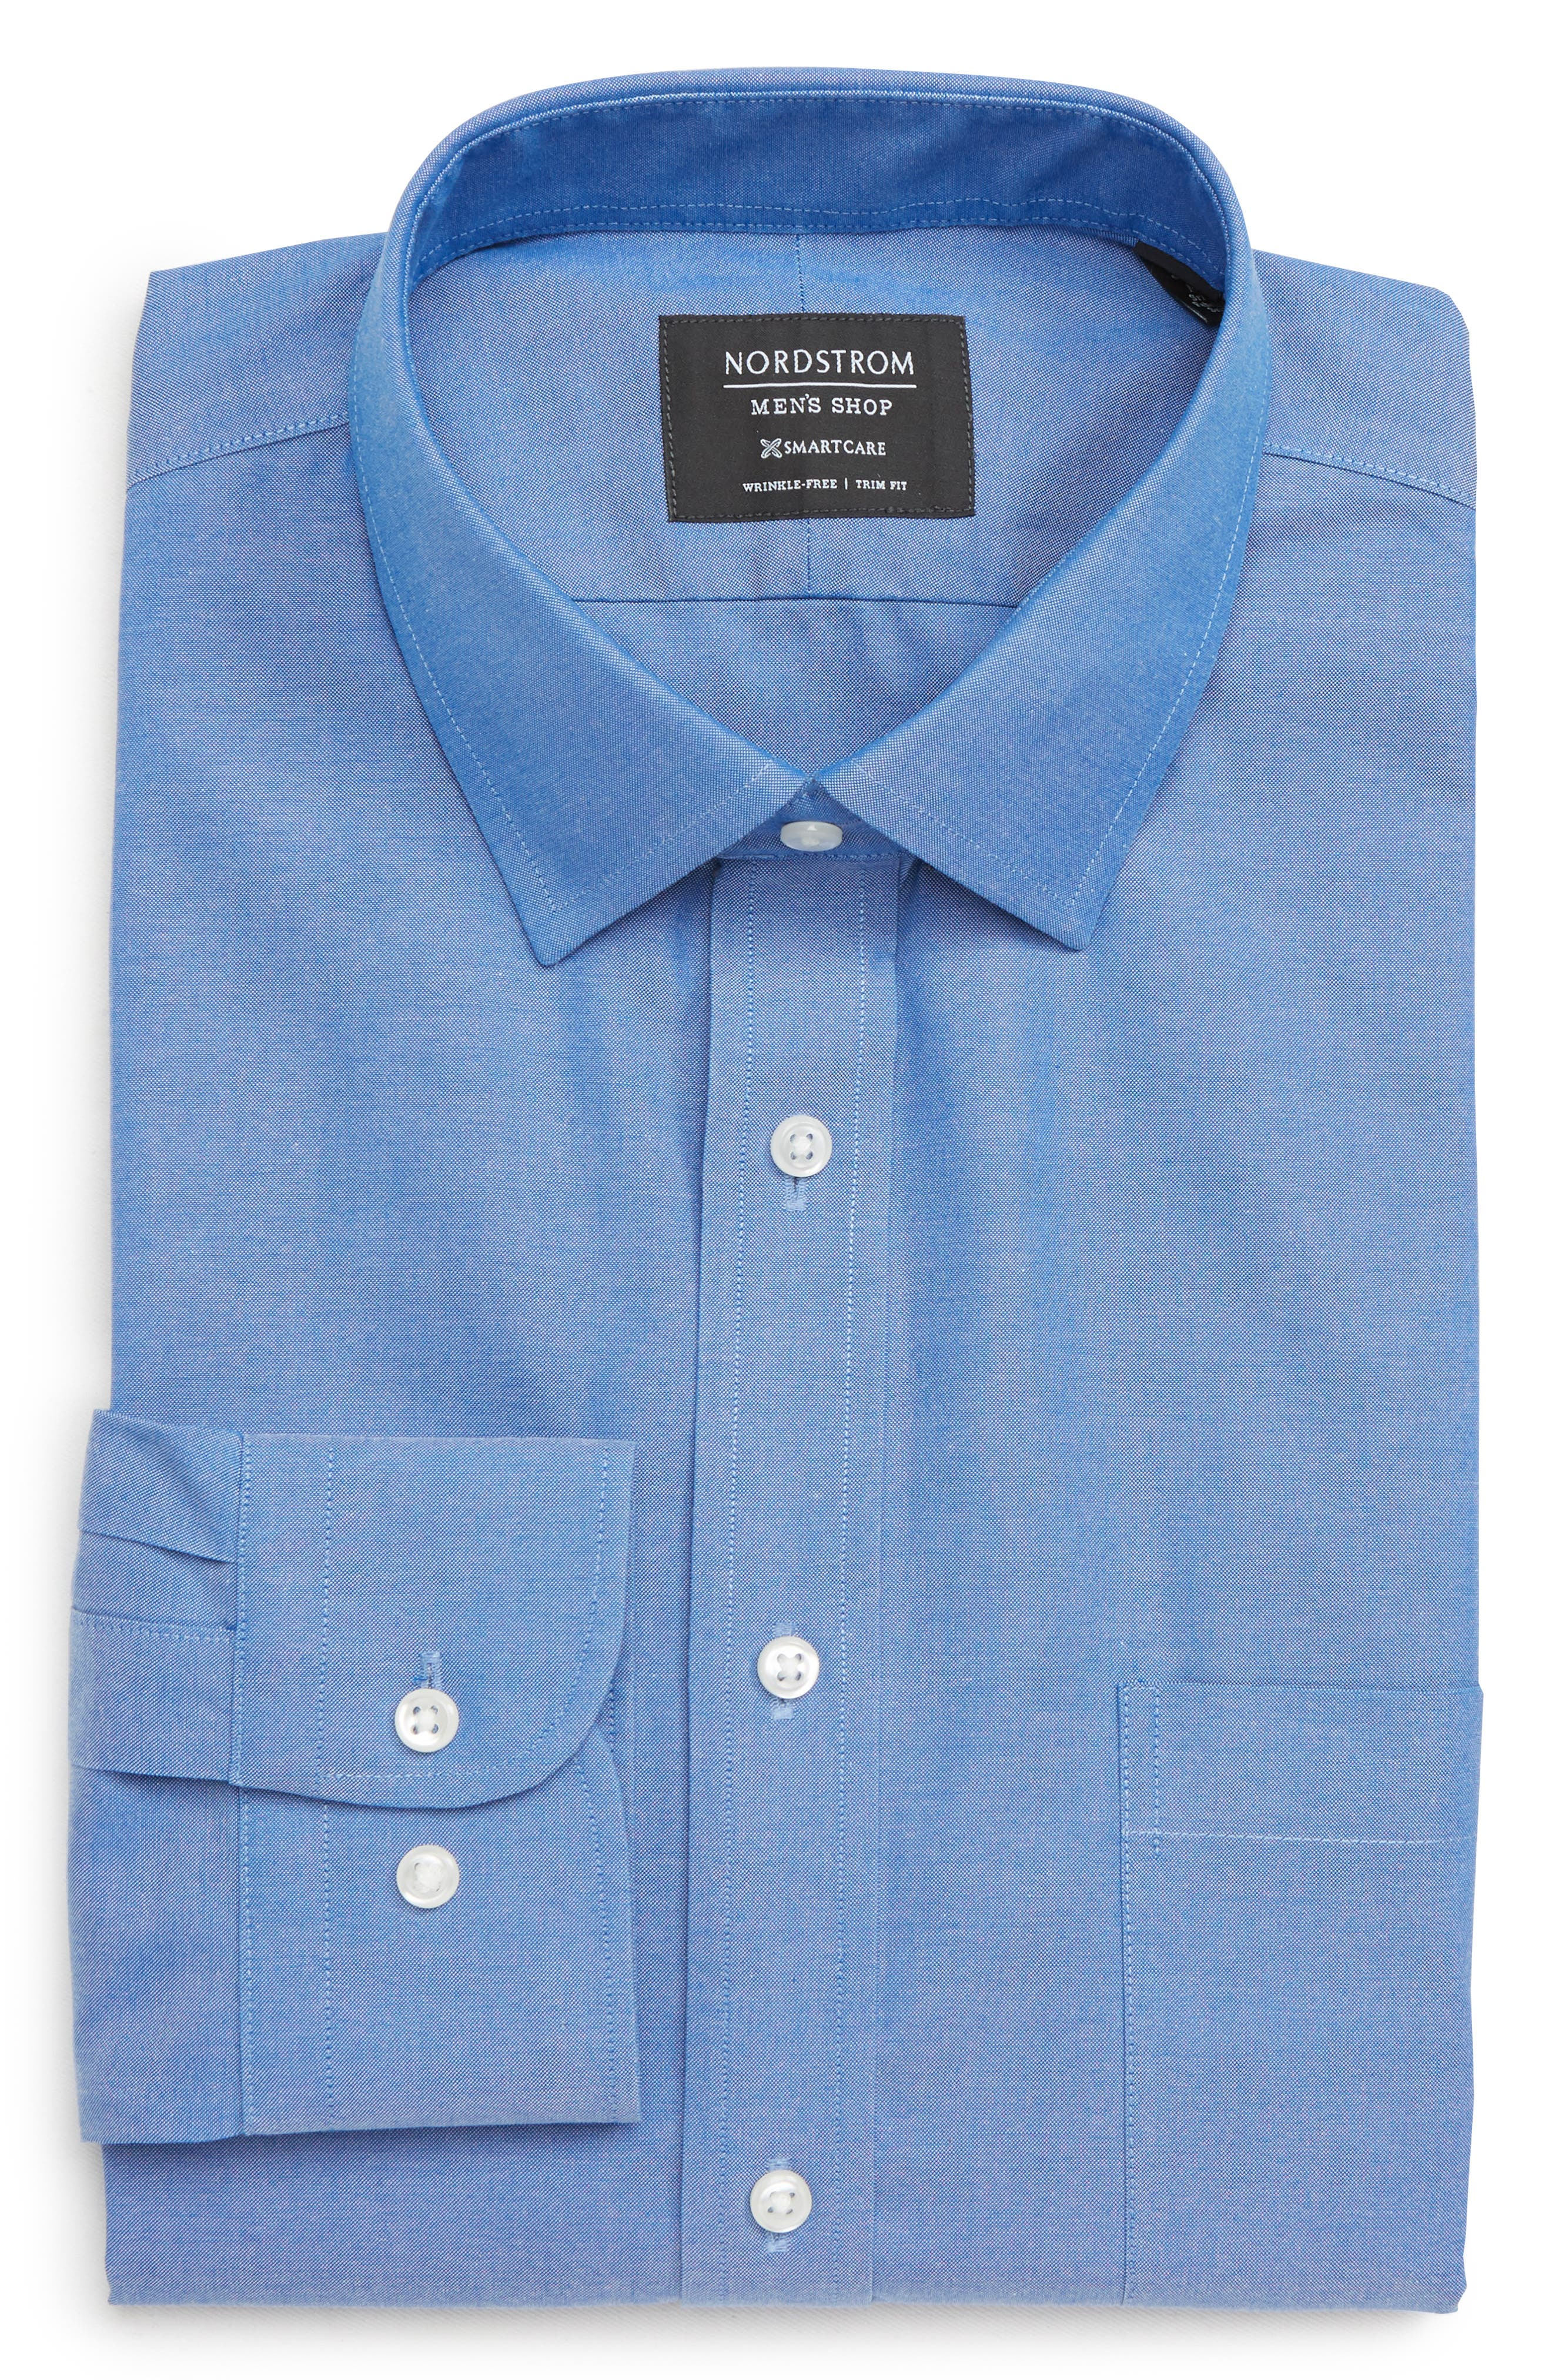 Nordstrom Shop Smartcare(TM) Trim Fit Solid Dress Shirt - Blue